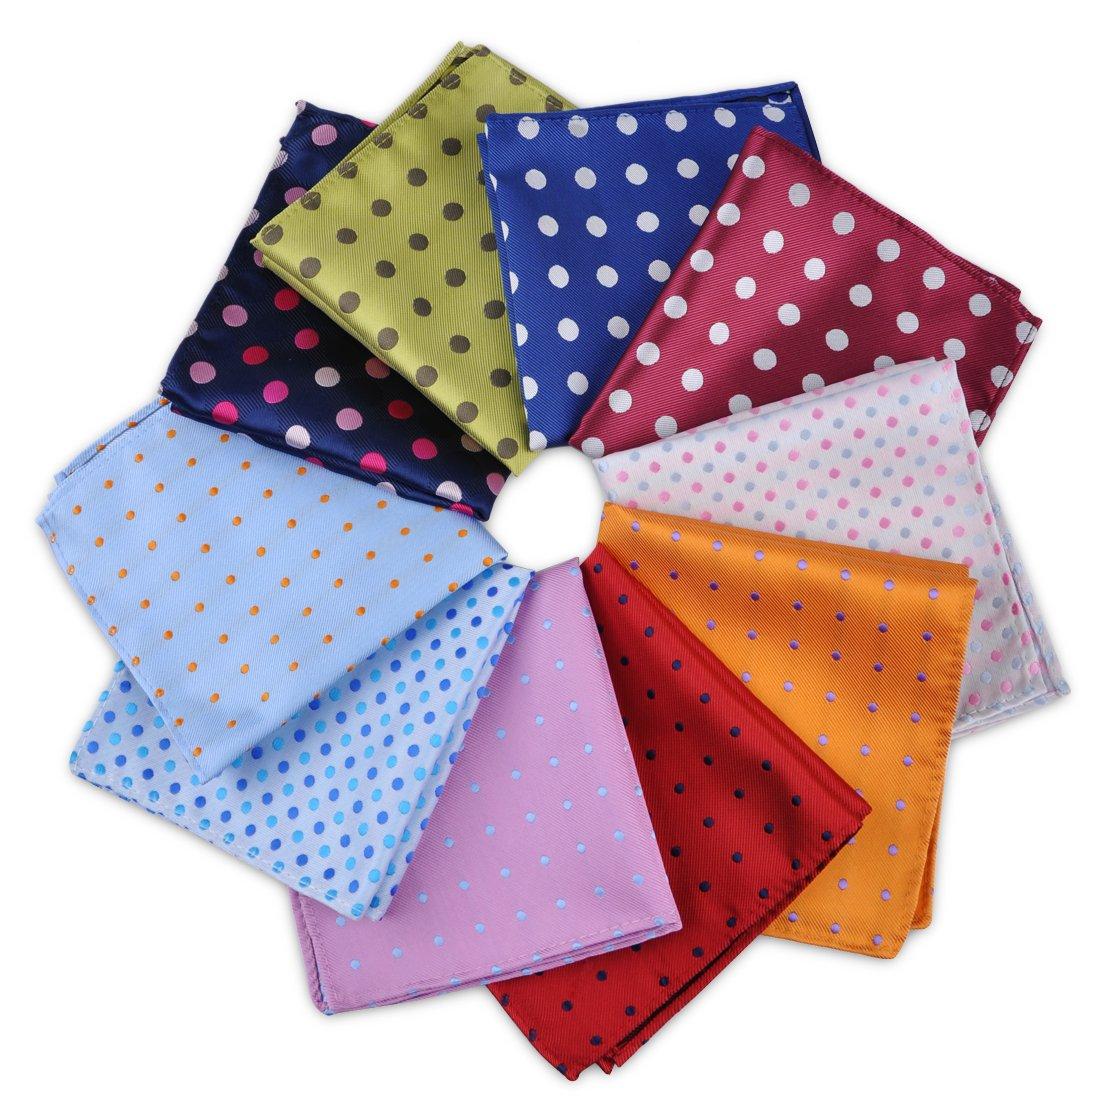 10 pcs 9.8x9.8'' Men's Polka Dot Pocket Square Jacquard Woven Handkerchief Gift ciciTree